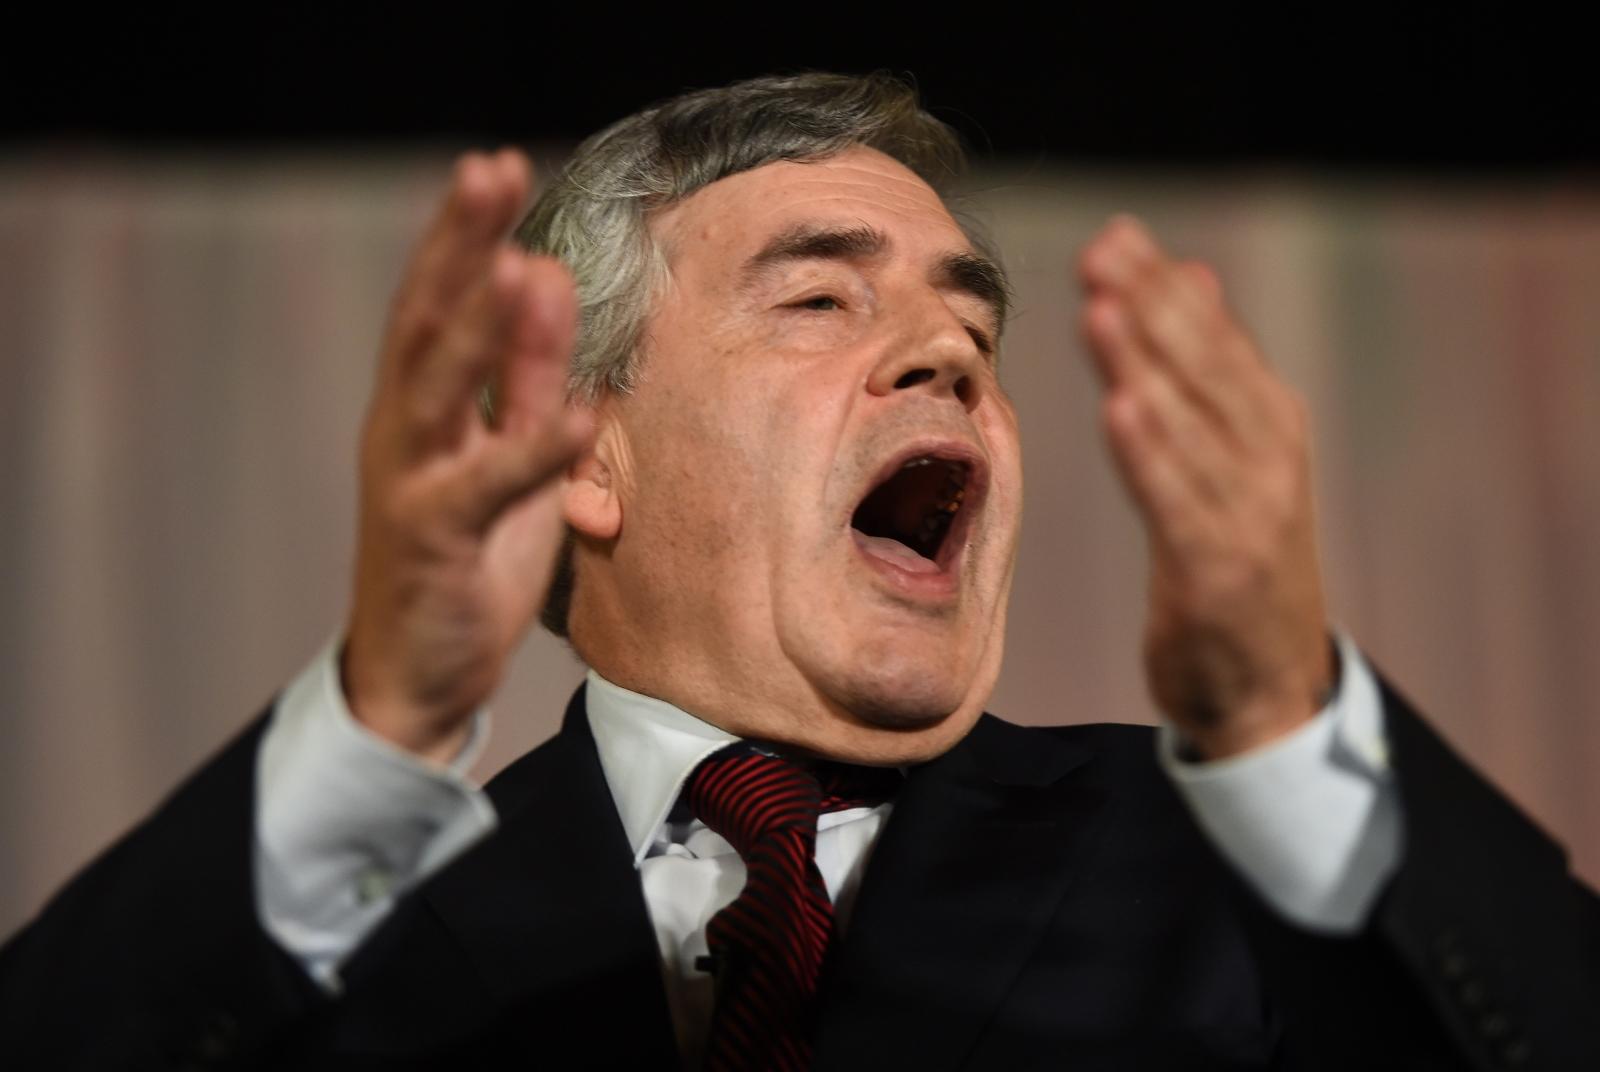 World is sleepwalking towards another financial crisis, former UK PM Brown warns